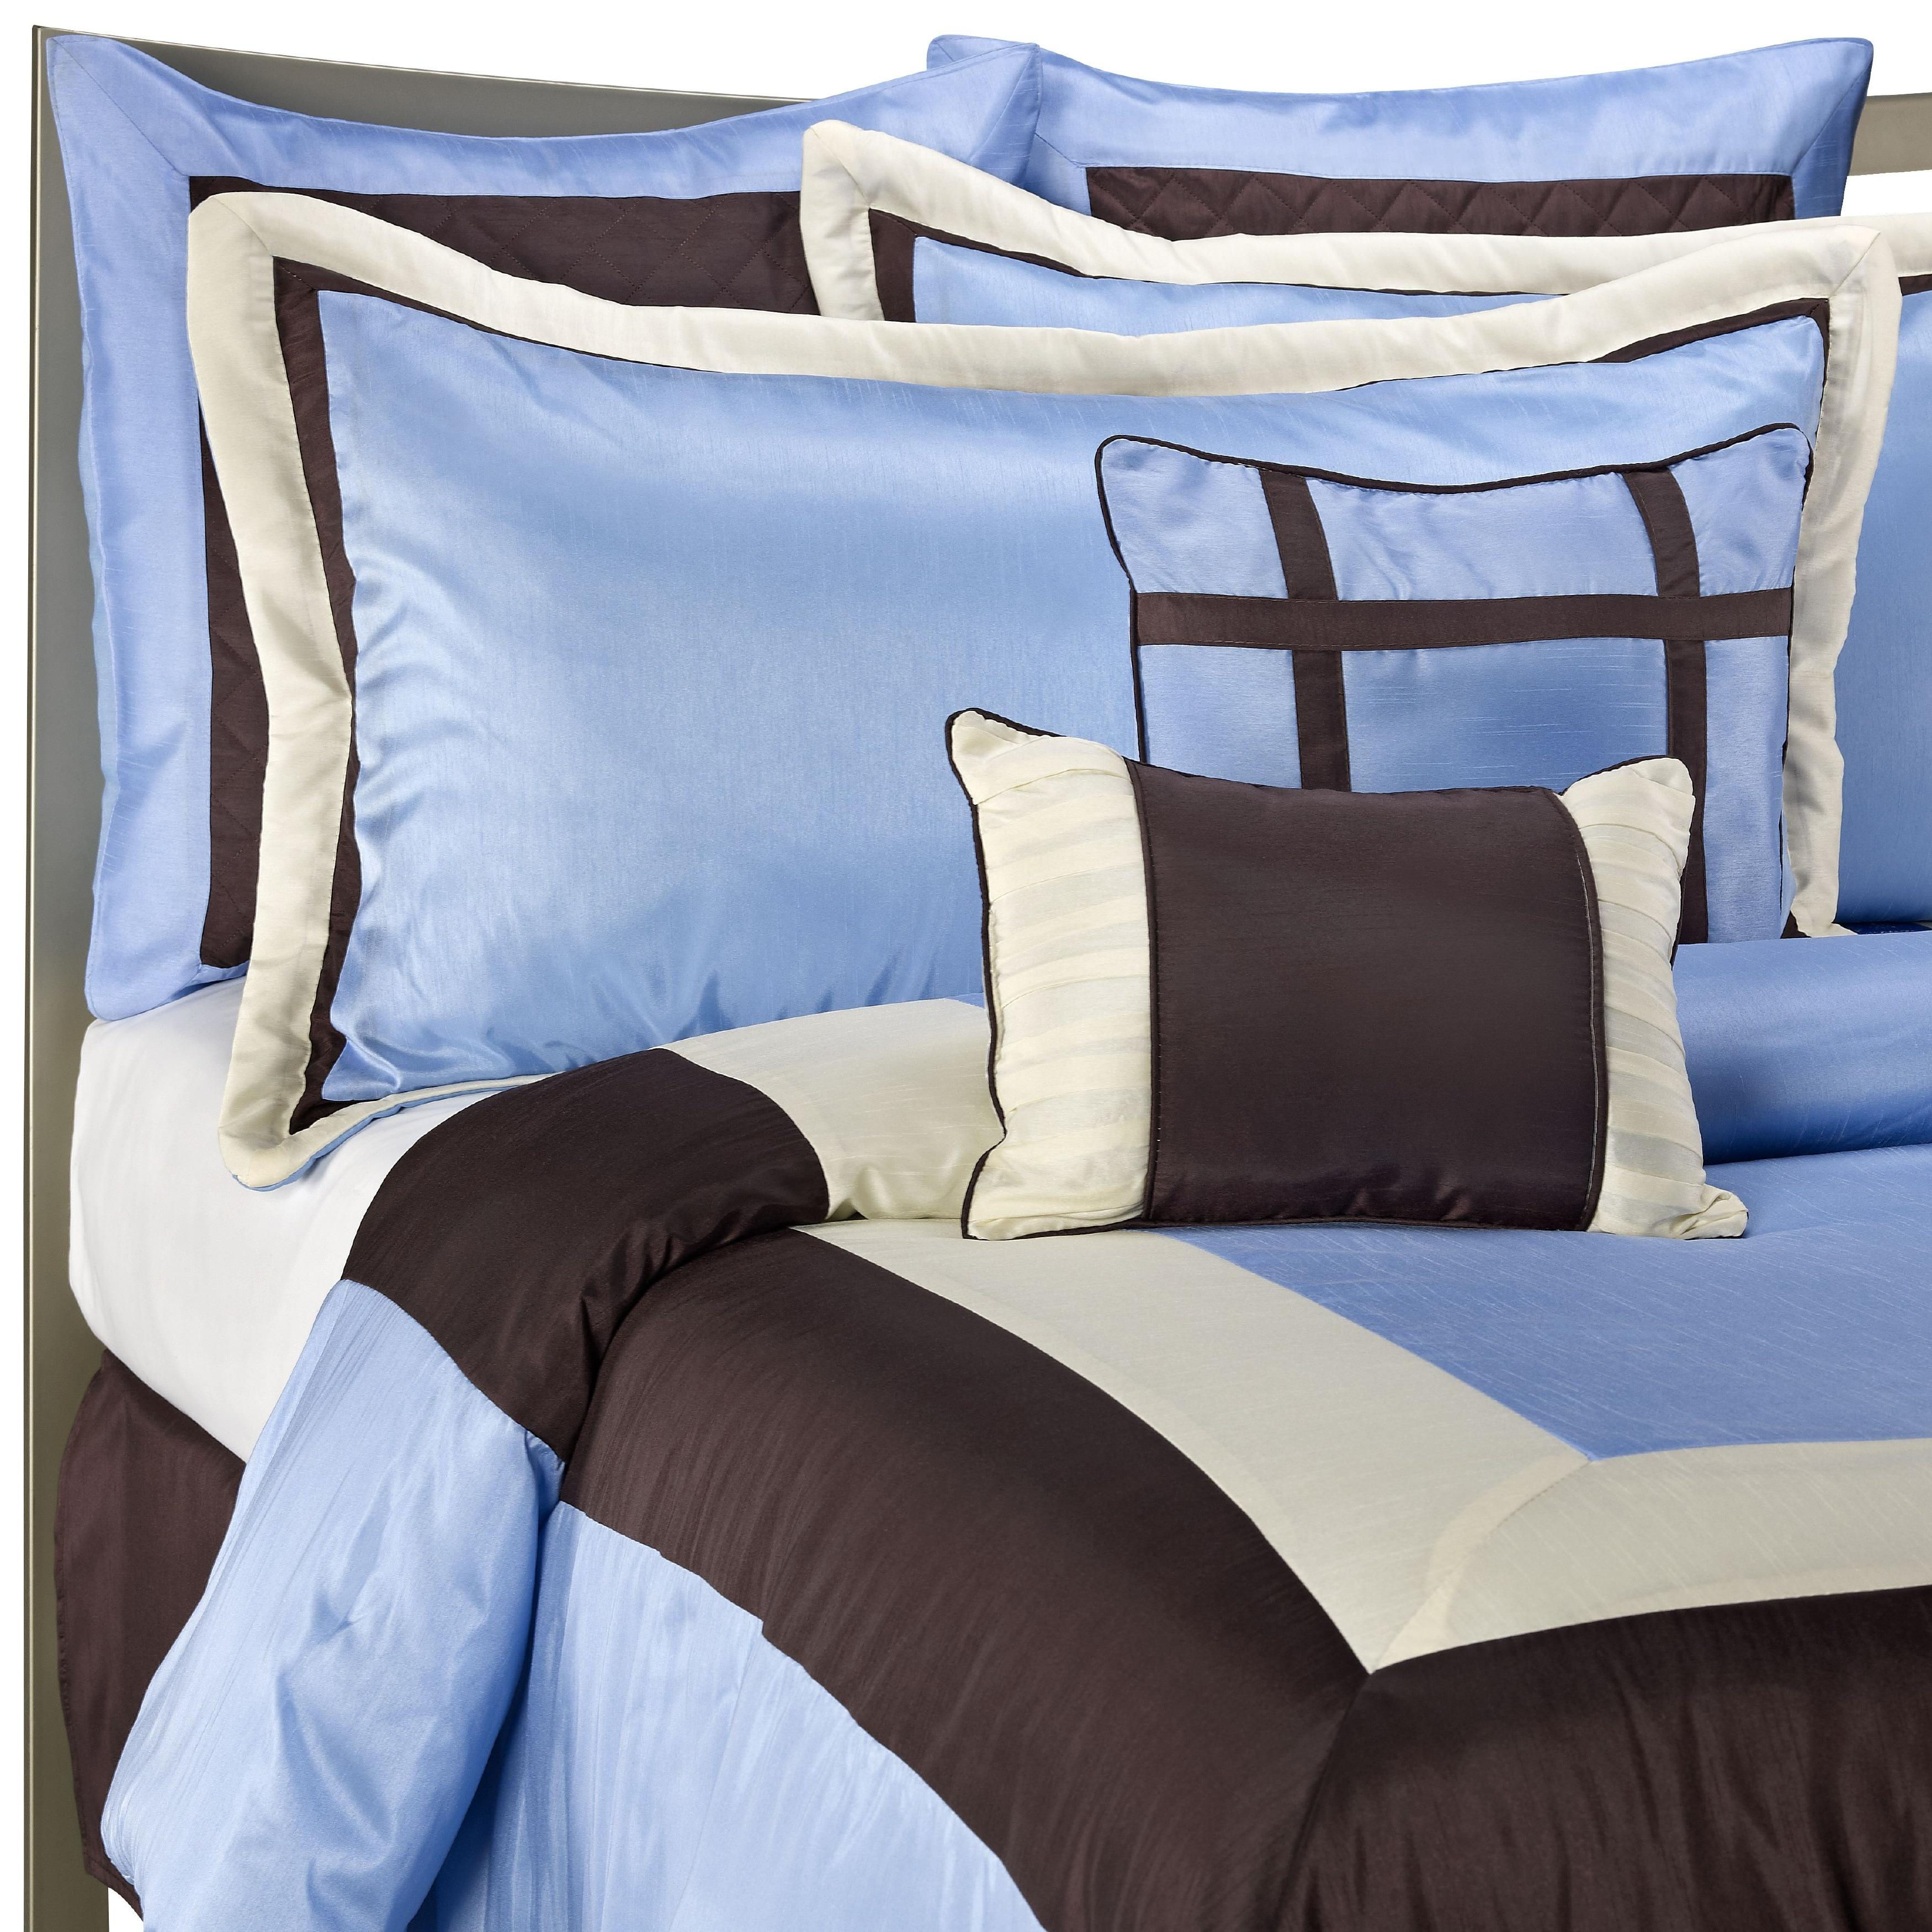 Classic Blue/Chocolate Brown 8-piece Comforter Set